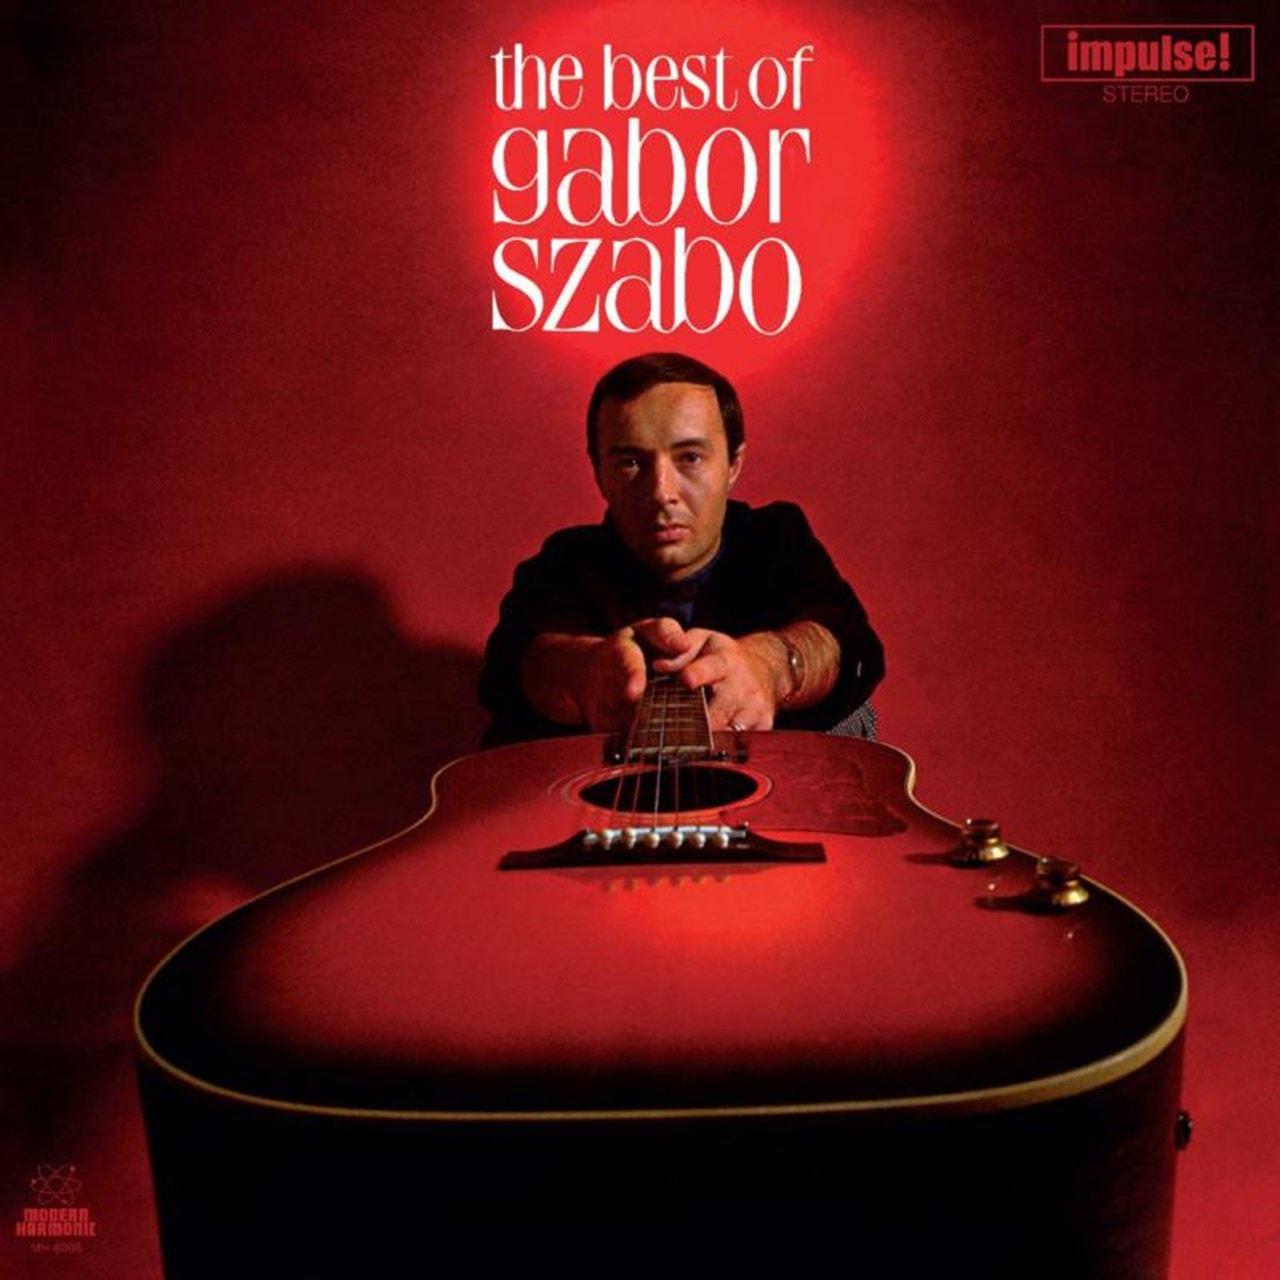 The Best of Gabor Szabo - 1